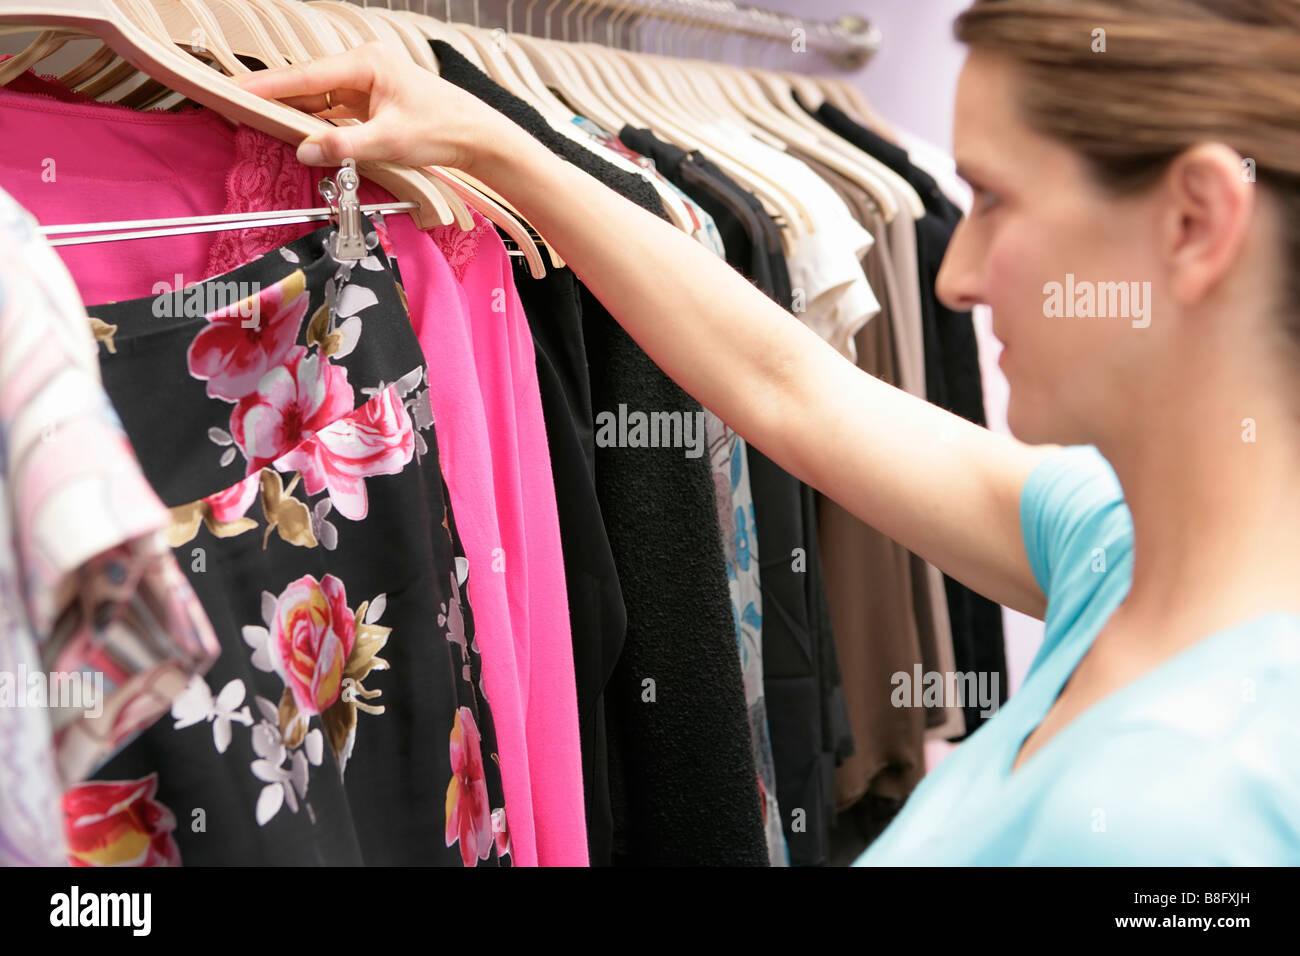 Donna incinta shopping 65cad6d736f